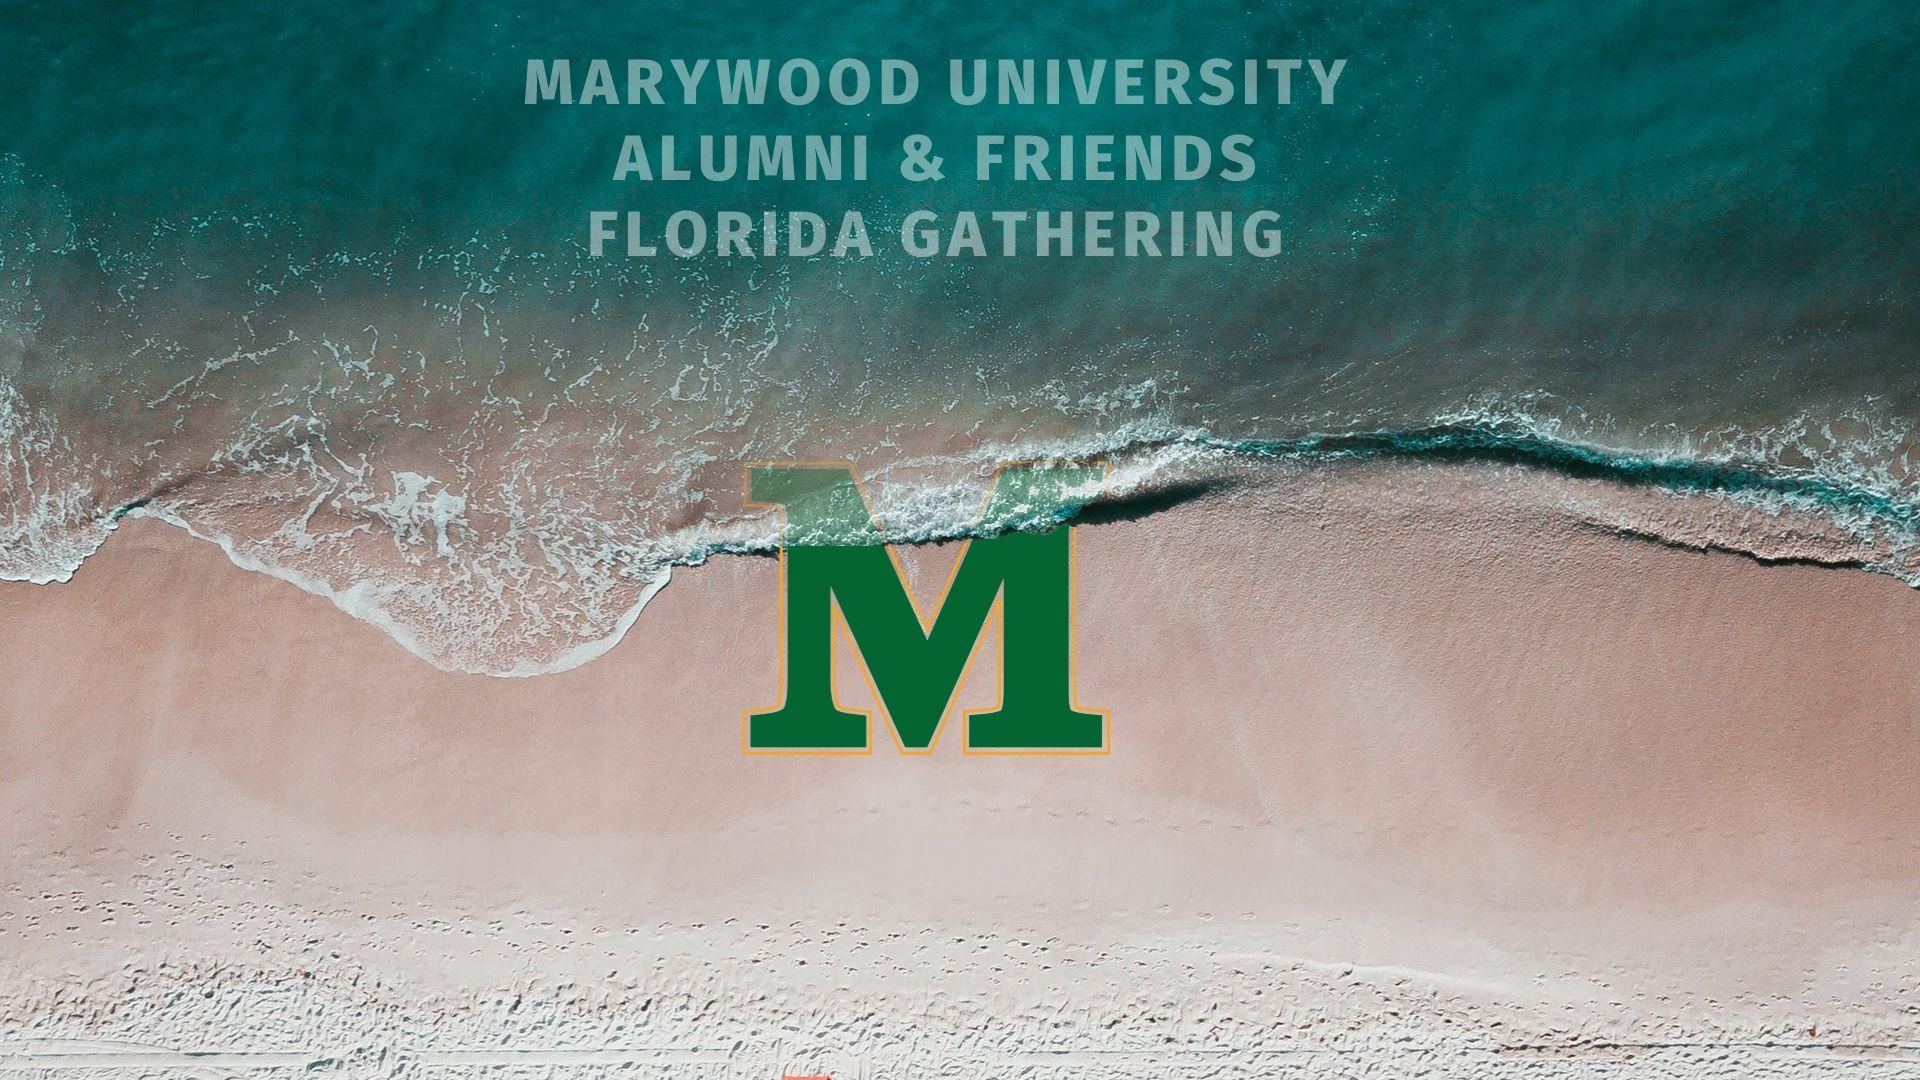 Marywood Florida Alumni & Friends Gathering